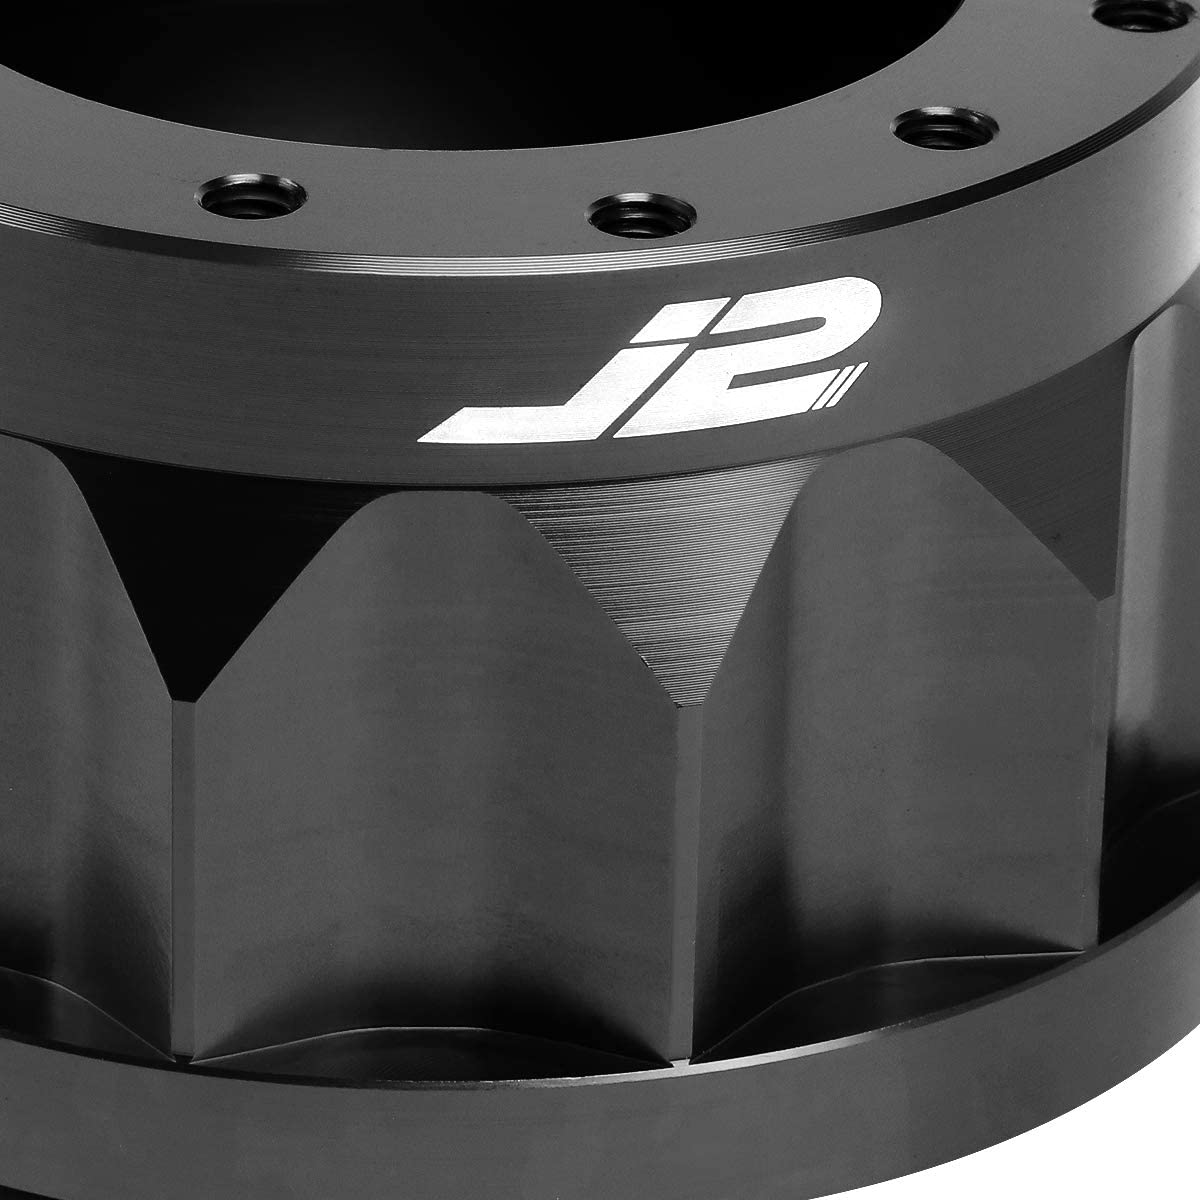 J2 Engineering Blue J2-HUB-OR18-BL 2 6-Bolt Aluminum Steering Wheel Hub Adapter 7 RX-8 Genesis Rio Optima